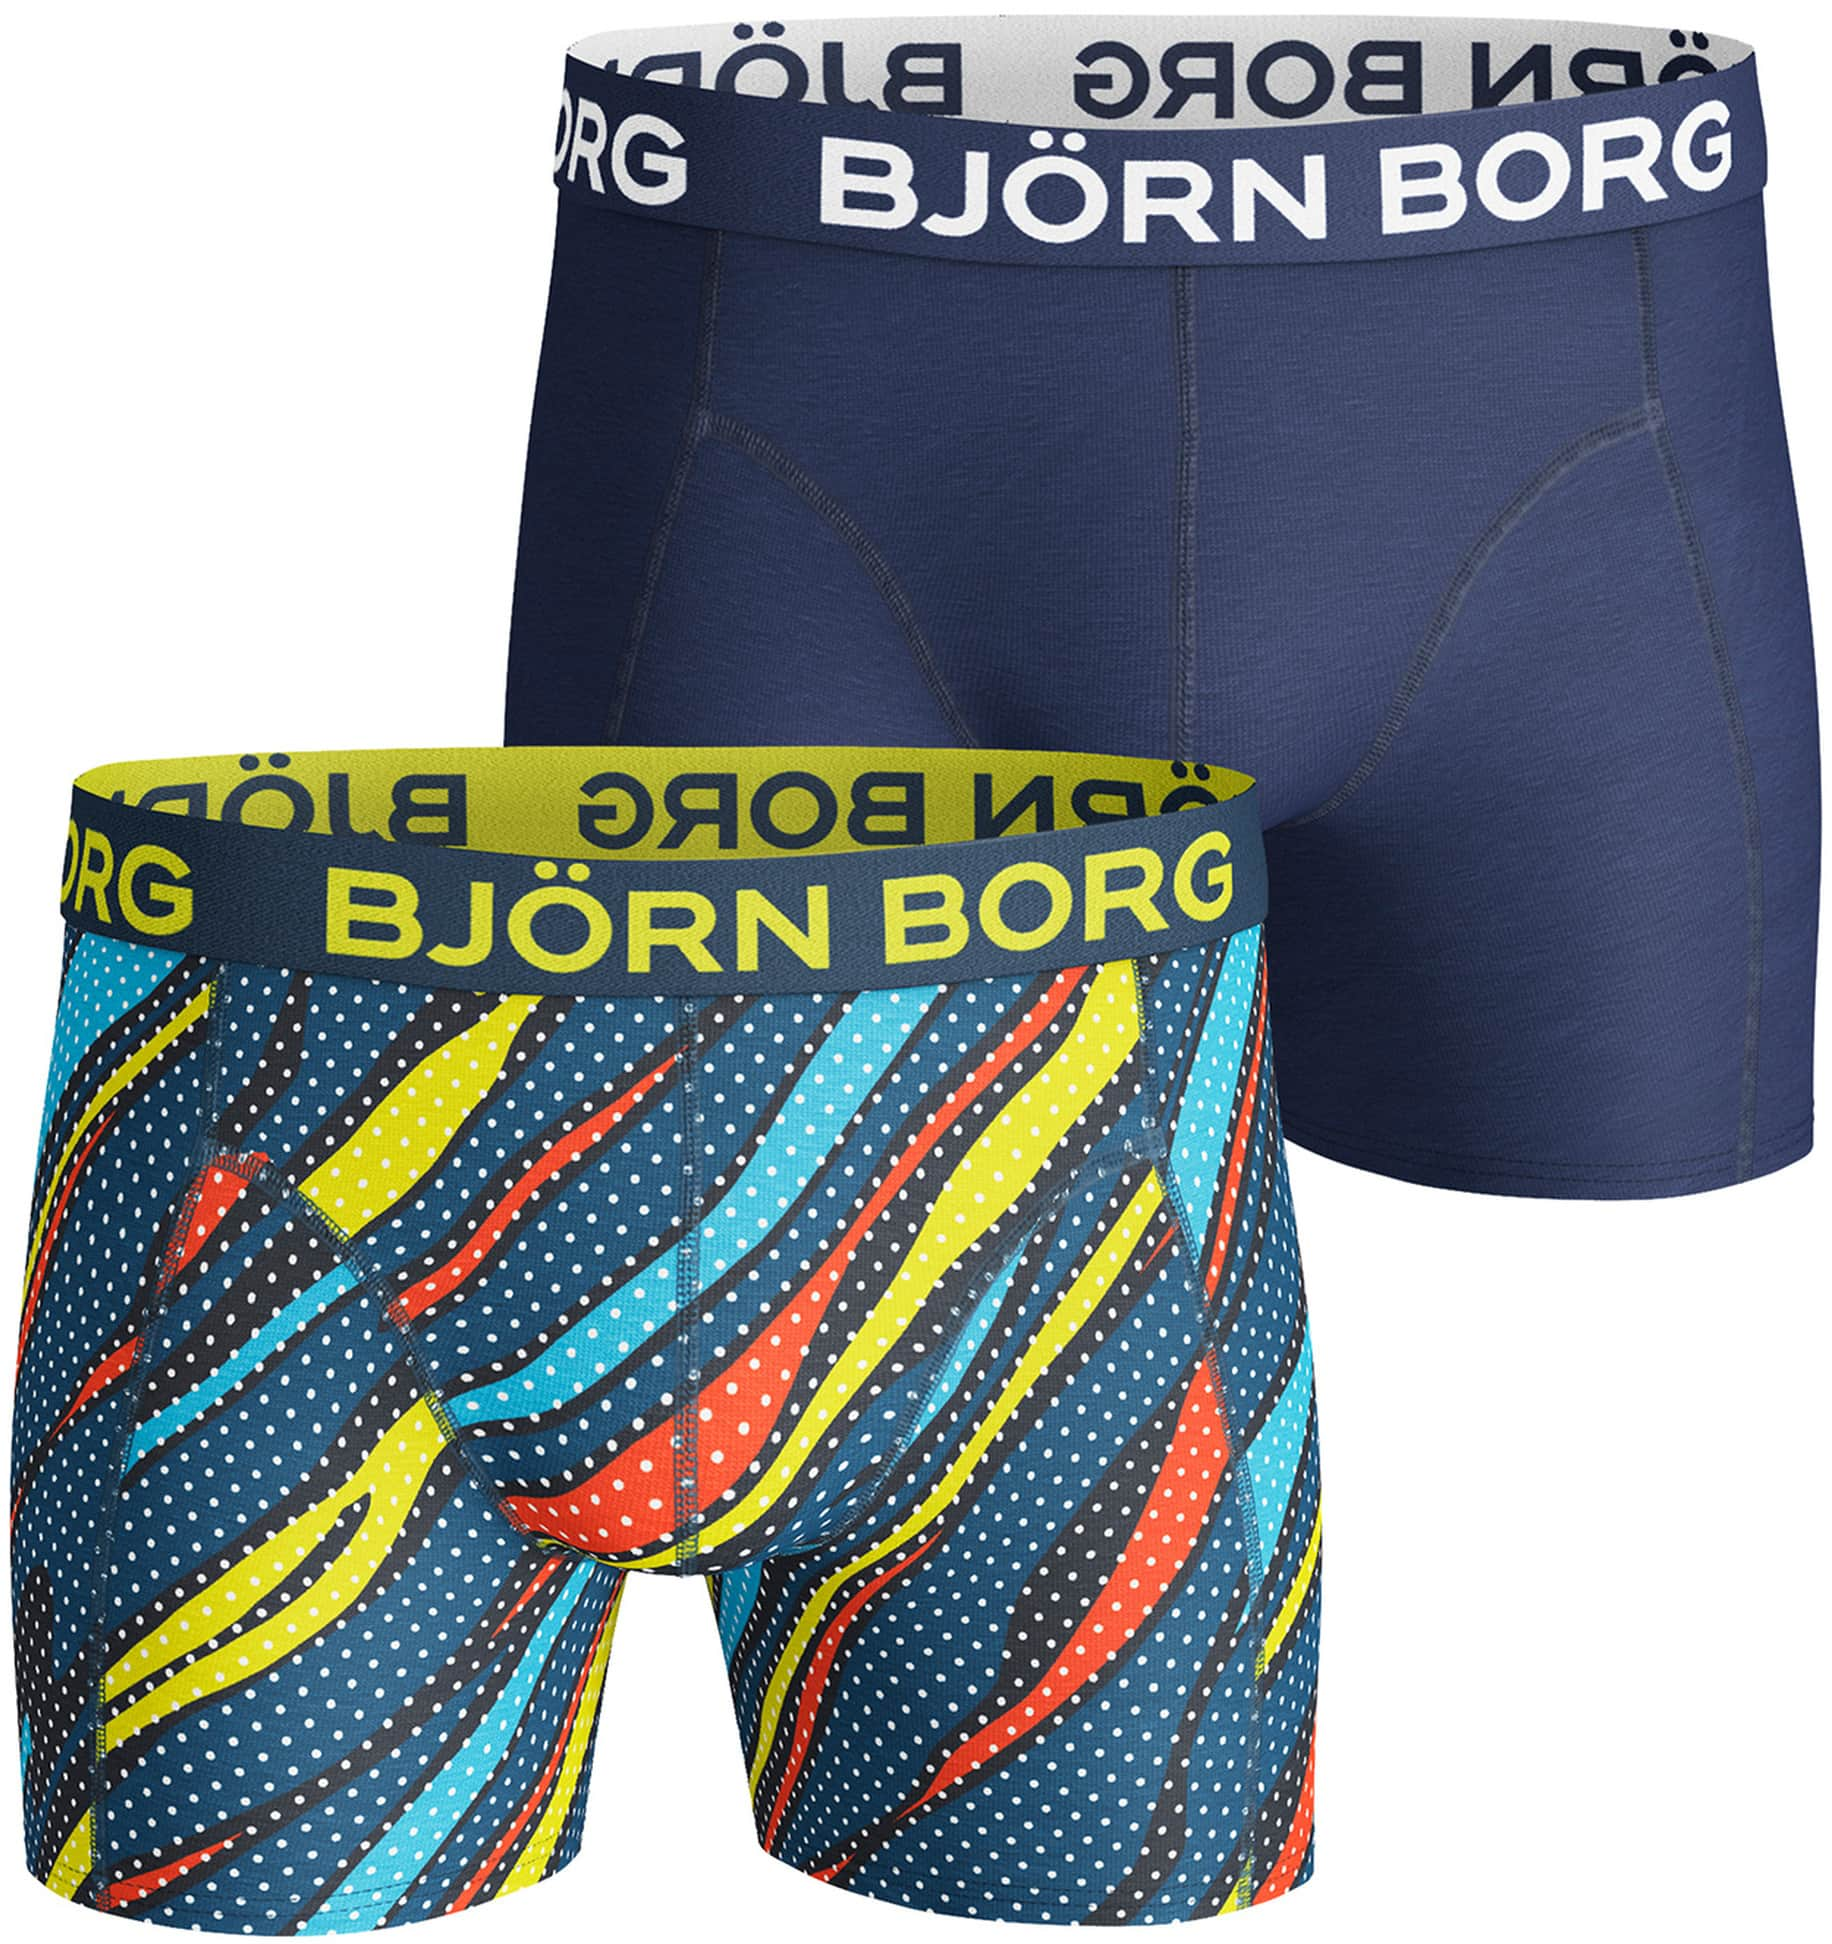 Bjorn Borg Boxers 2-Pack Blauw en Kleur foto 0